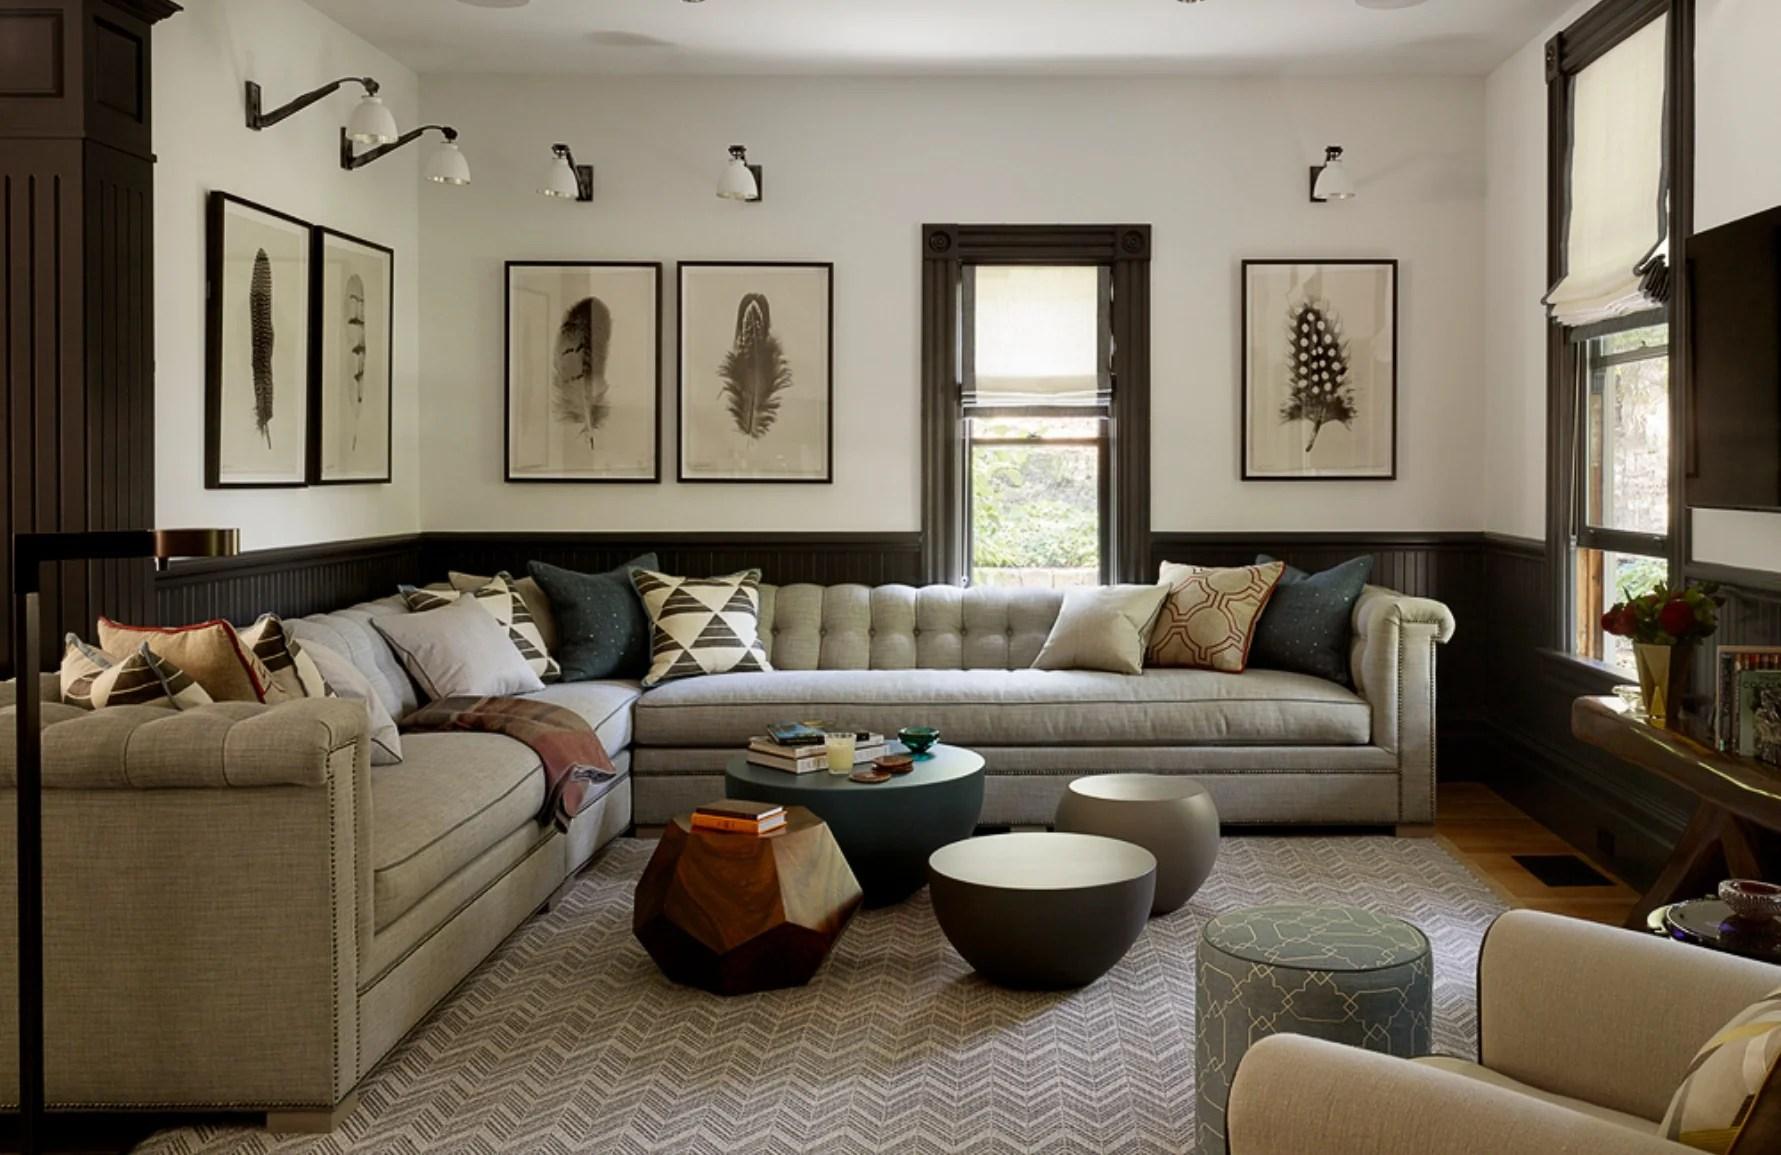 12 Small Living Room Layout Design Ideas Luxdeco Com